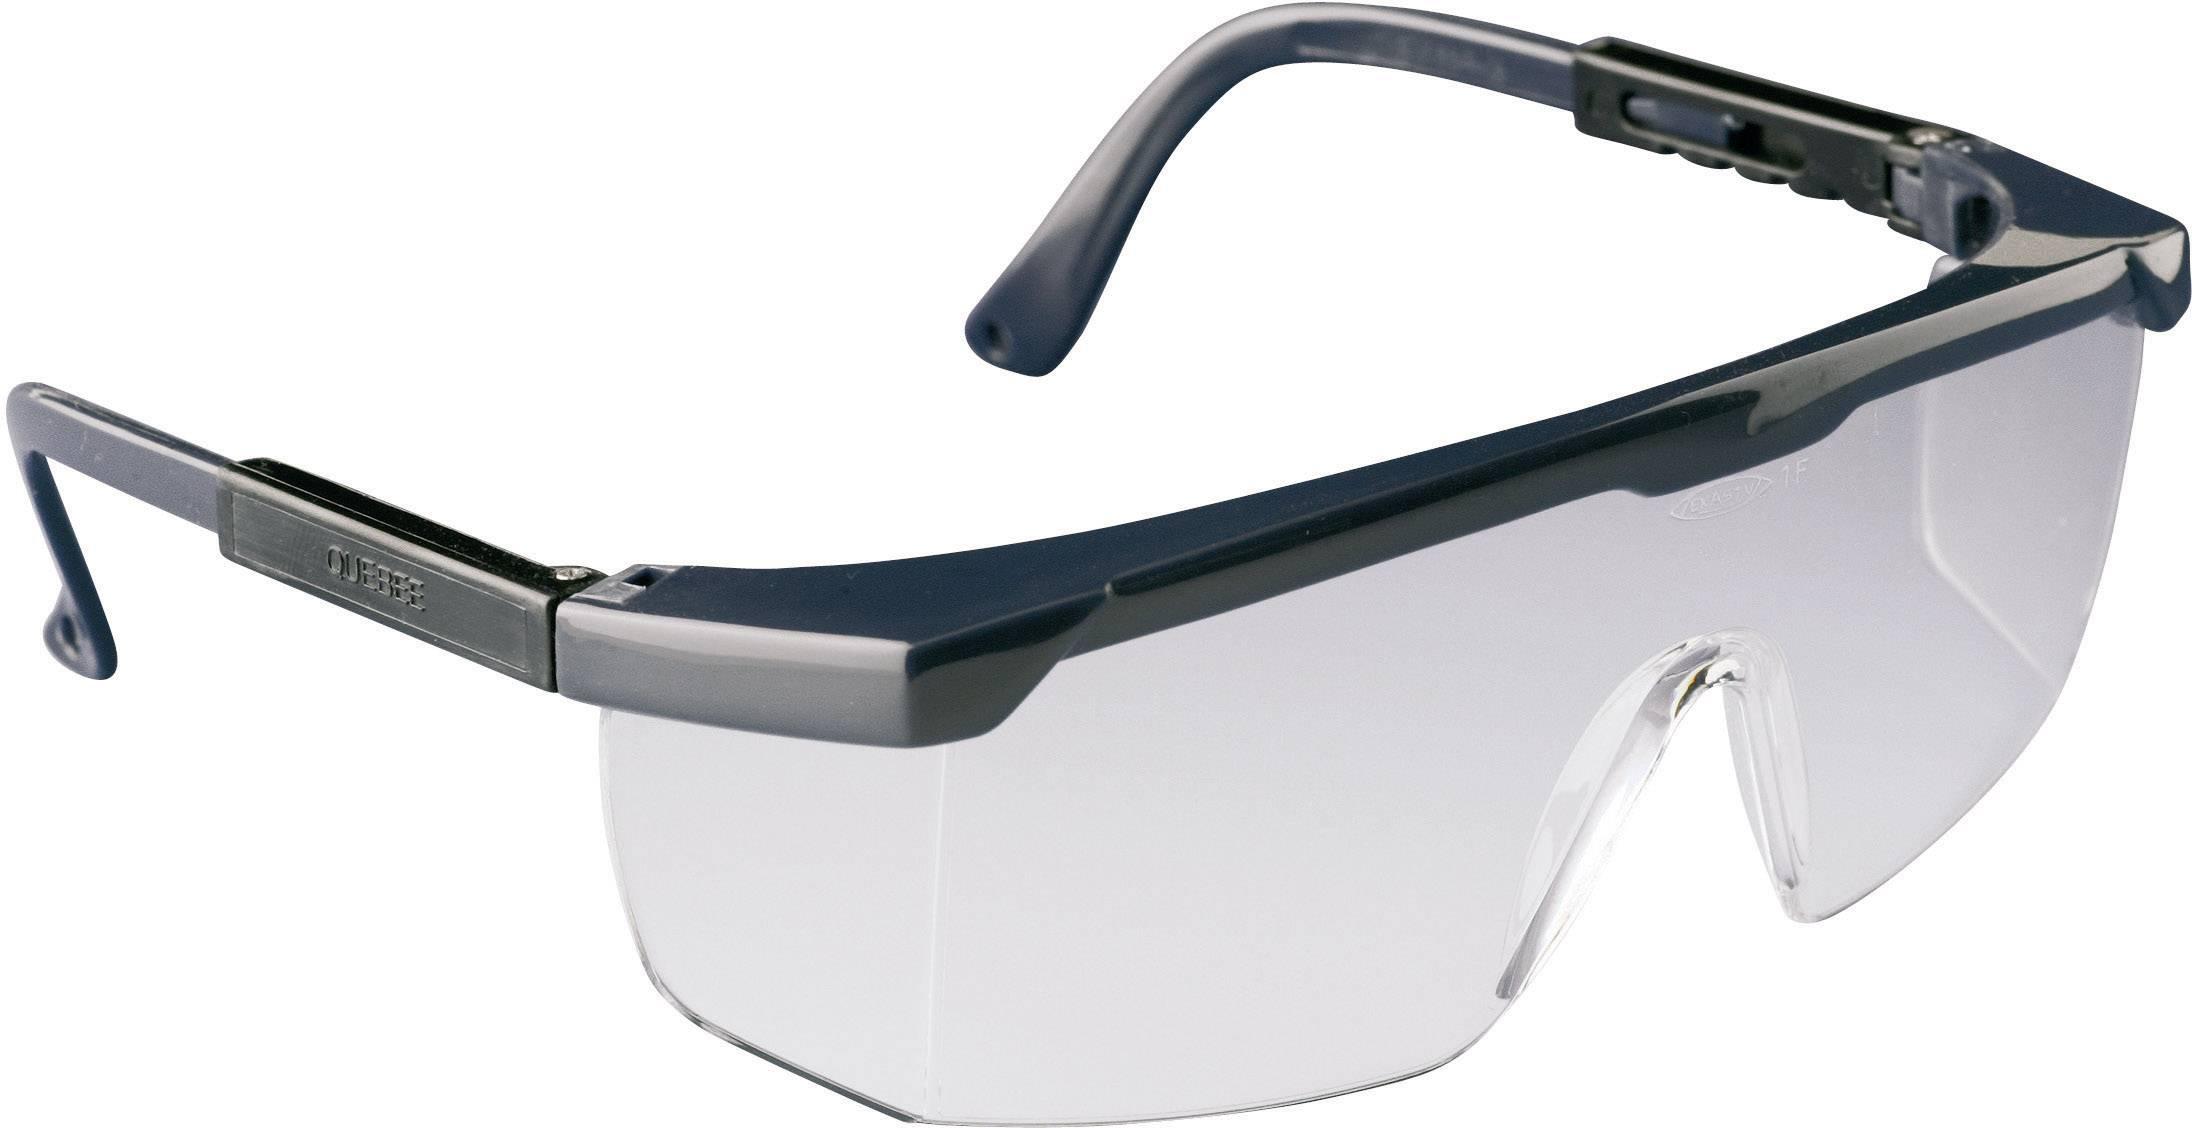 Ochranné okuliare Ekastu Sekur Safety Clarex